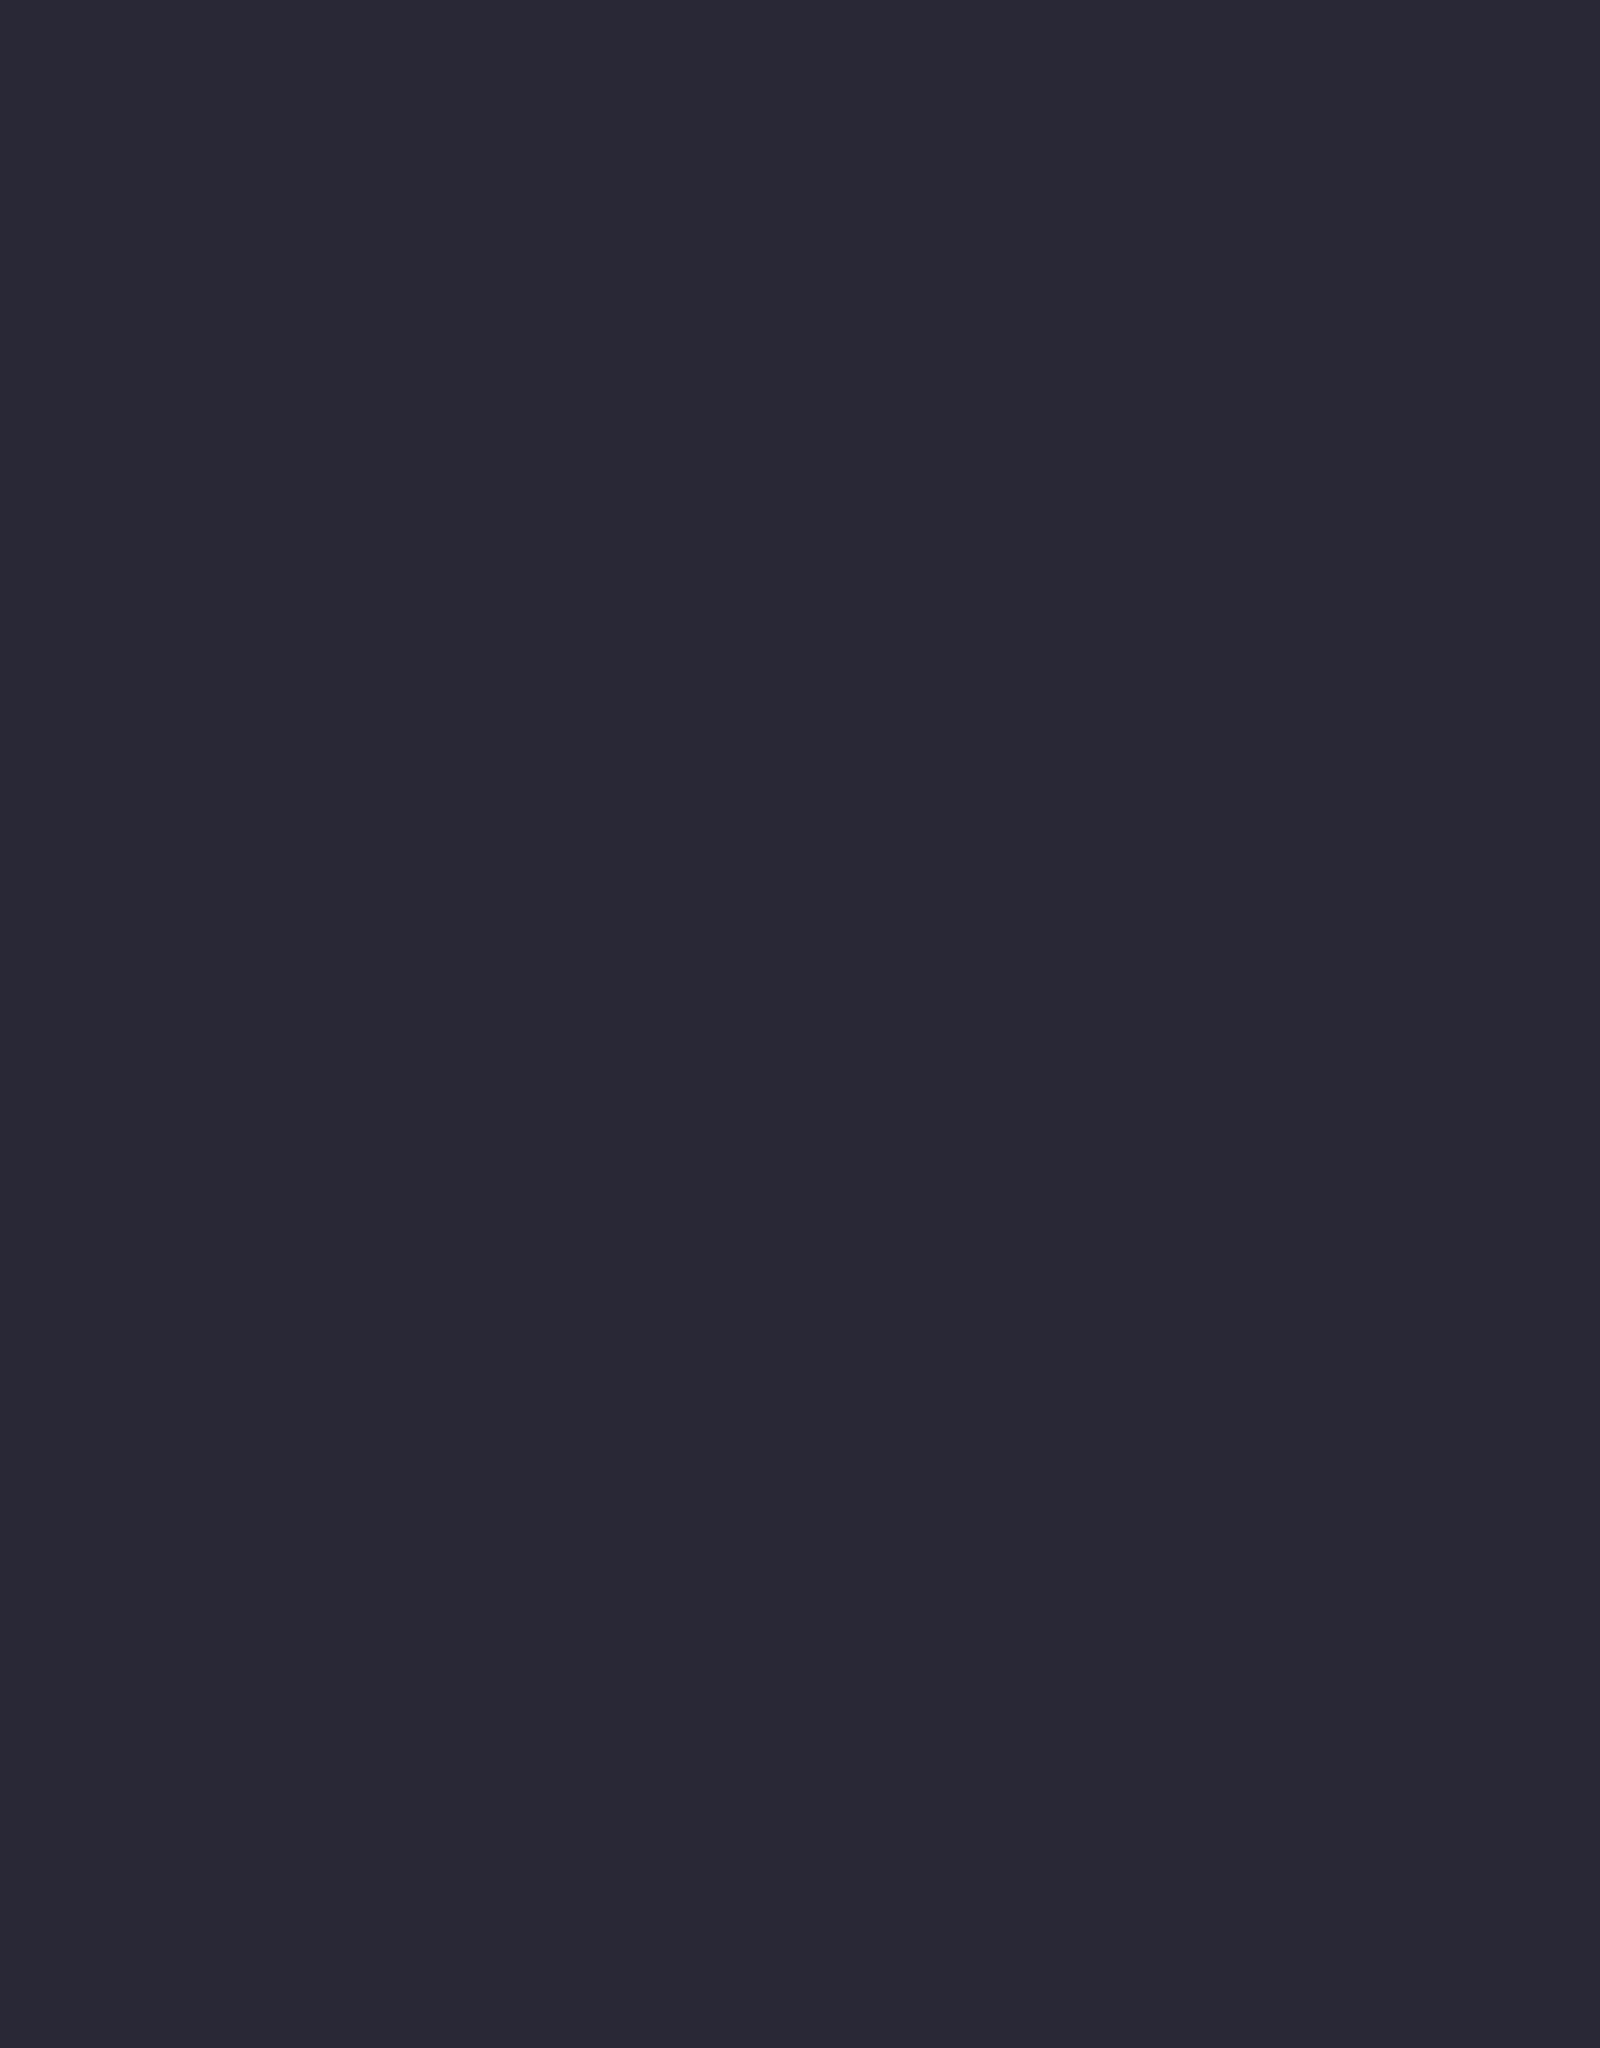 Trapsuutjies Nachtblauw Large